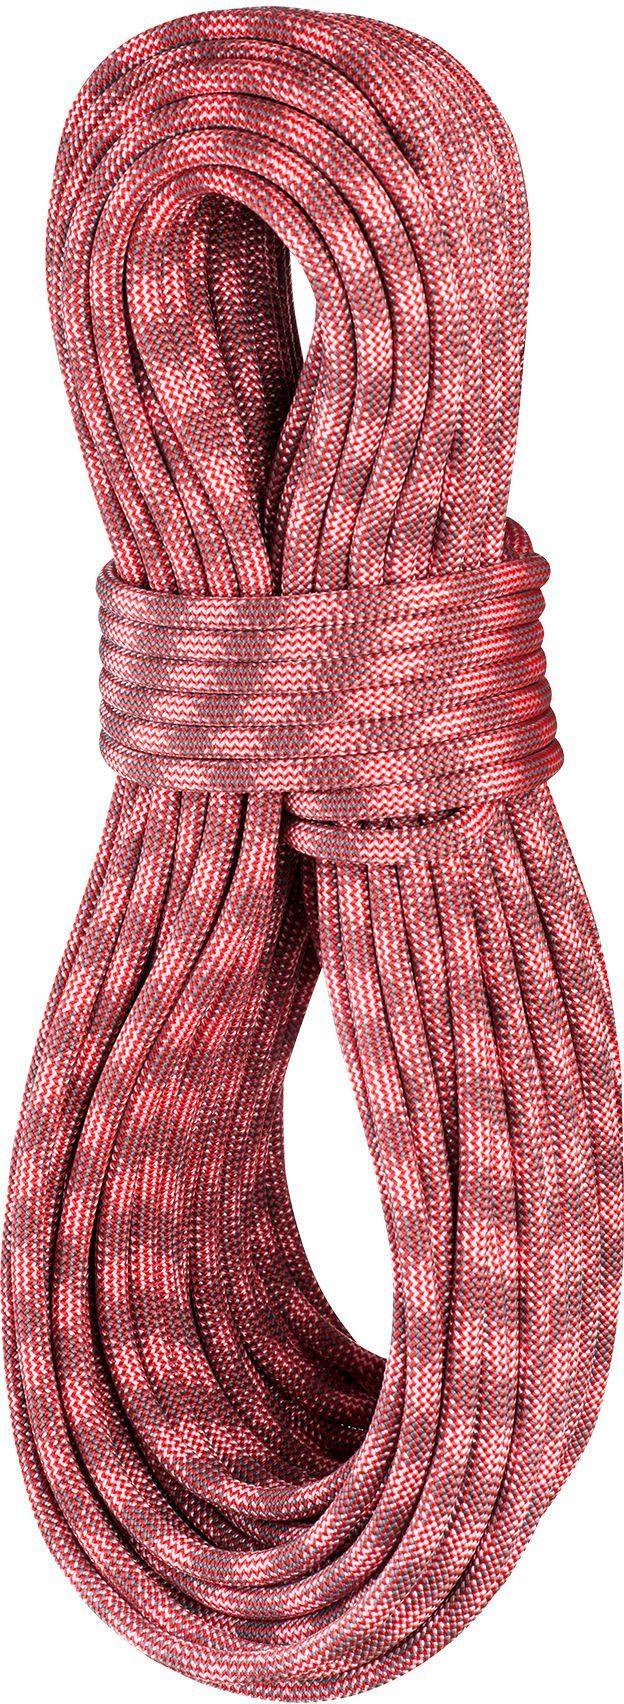 Edelrid Kletterseil »Python Rope 10mm 50m«